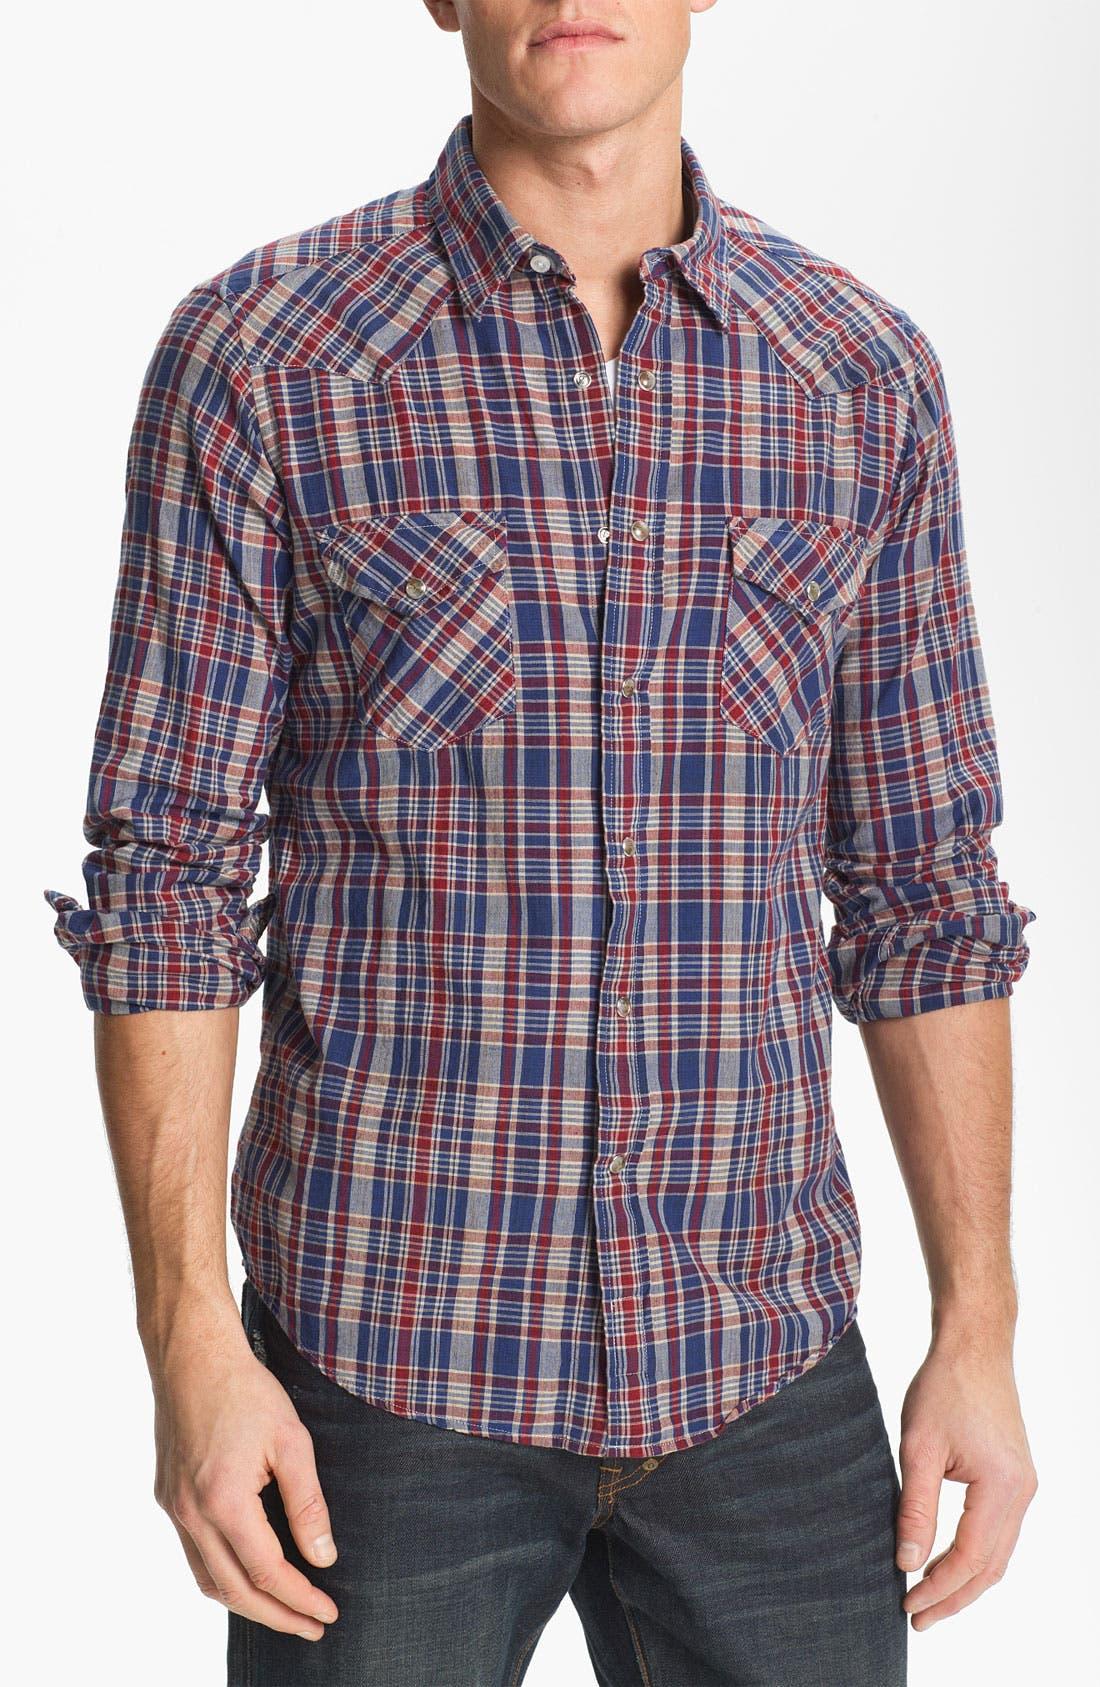 Main Image - Pendleton 'Epic' Madras Plaid Western Shirt